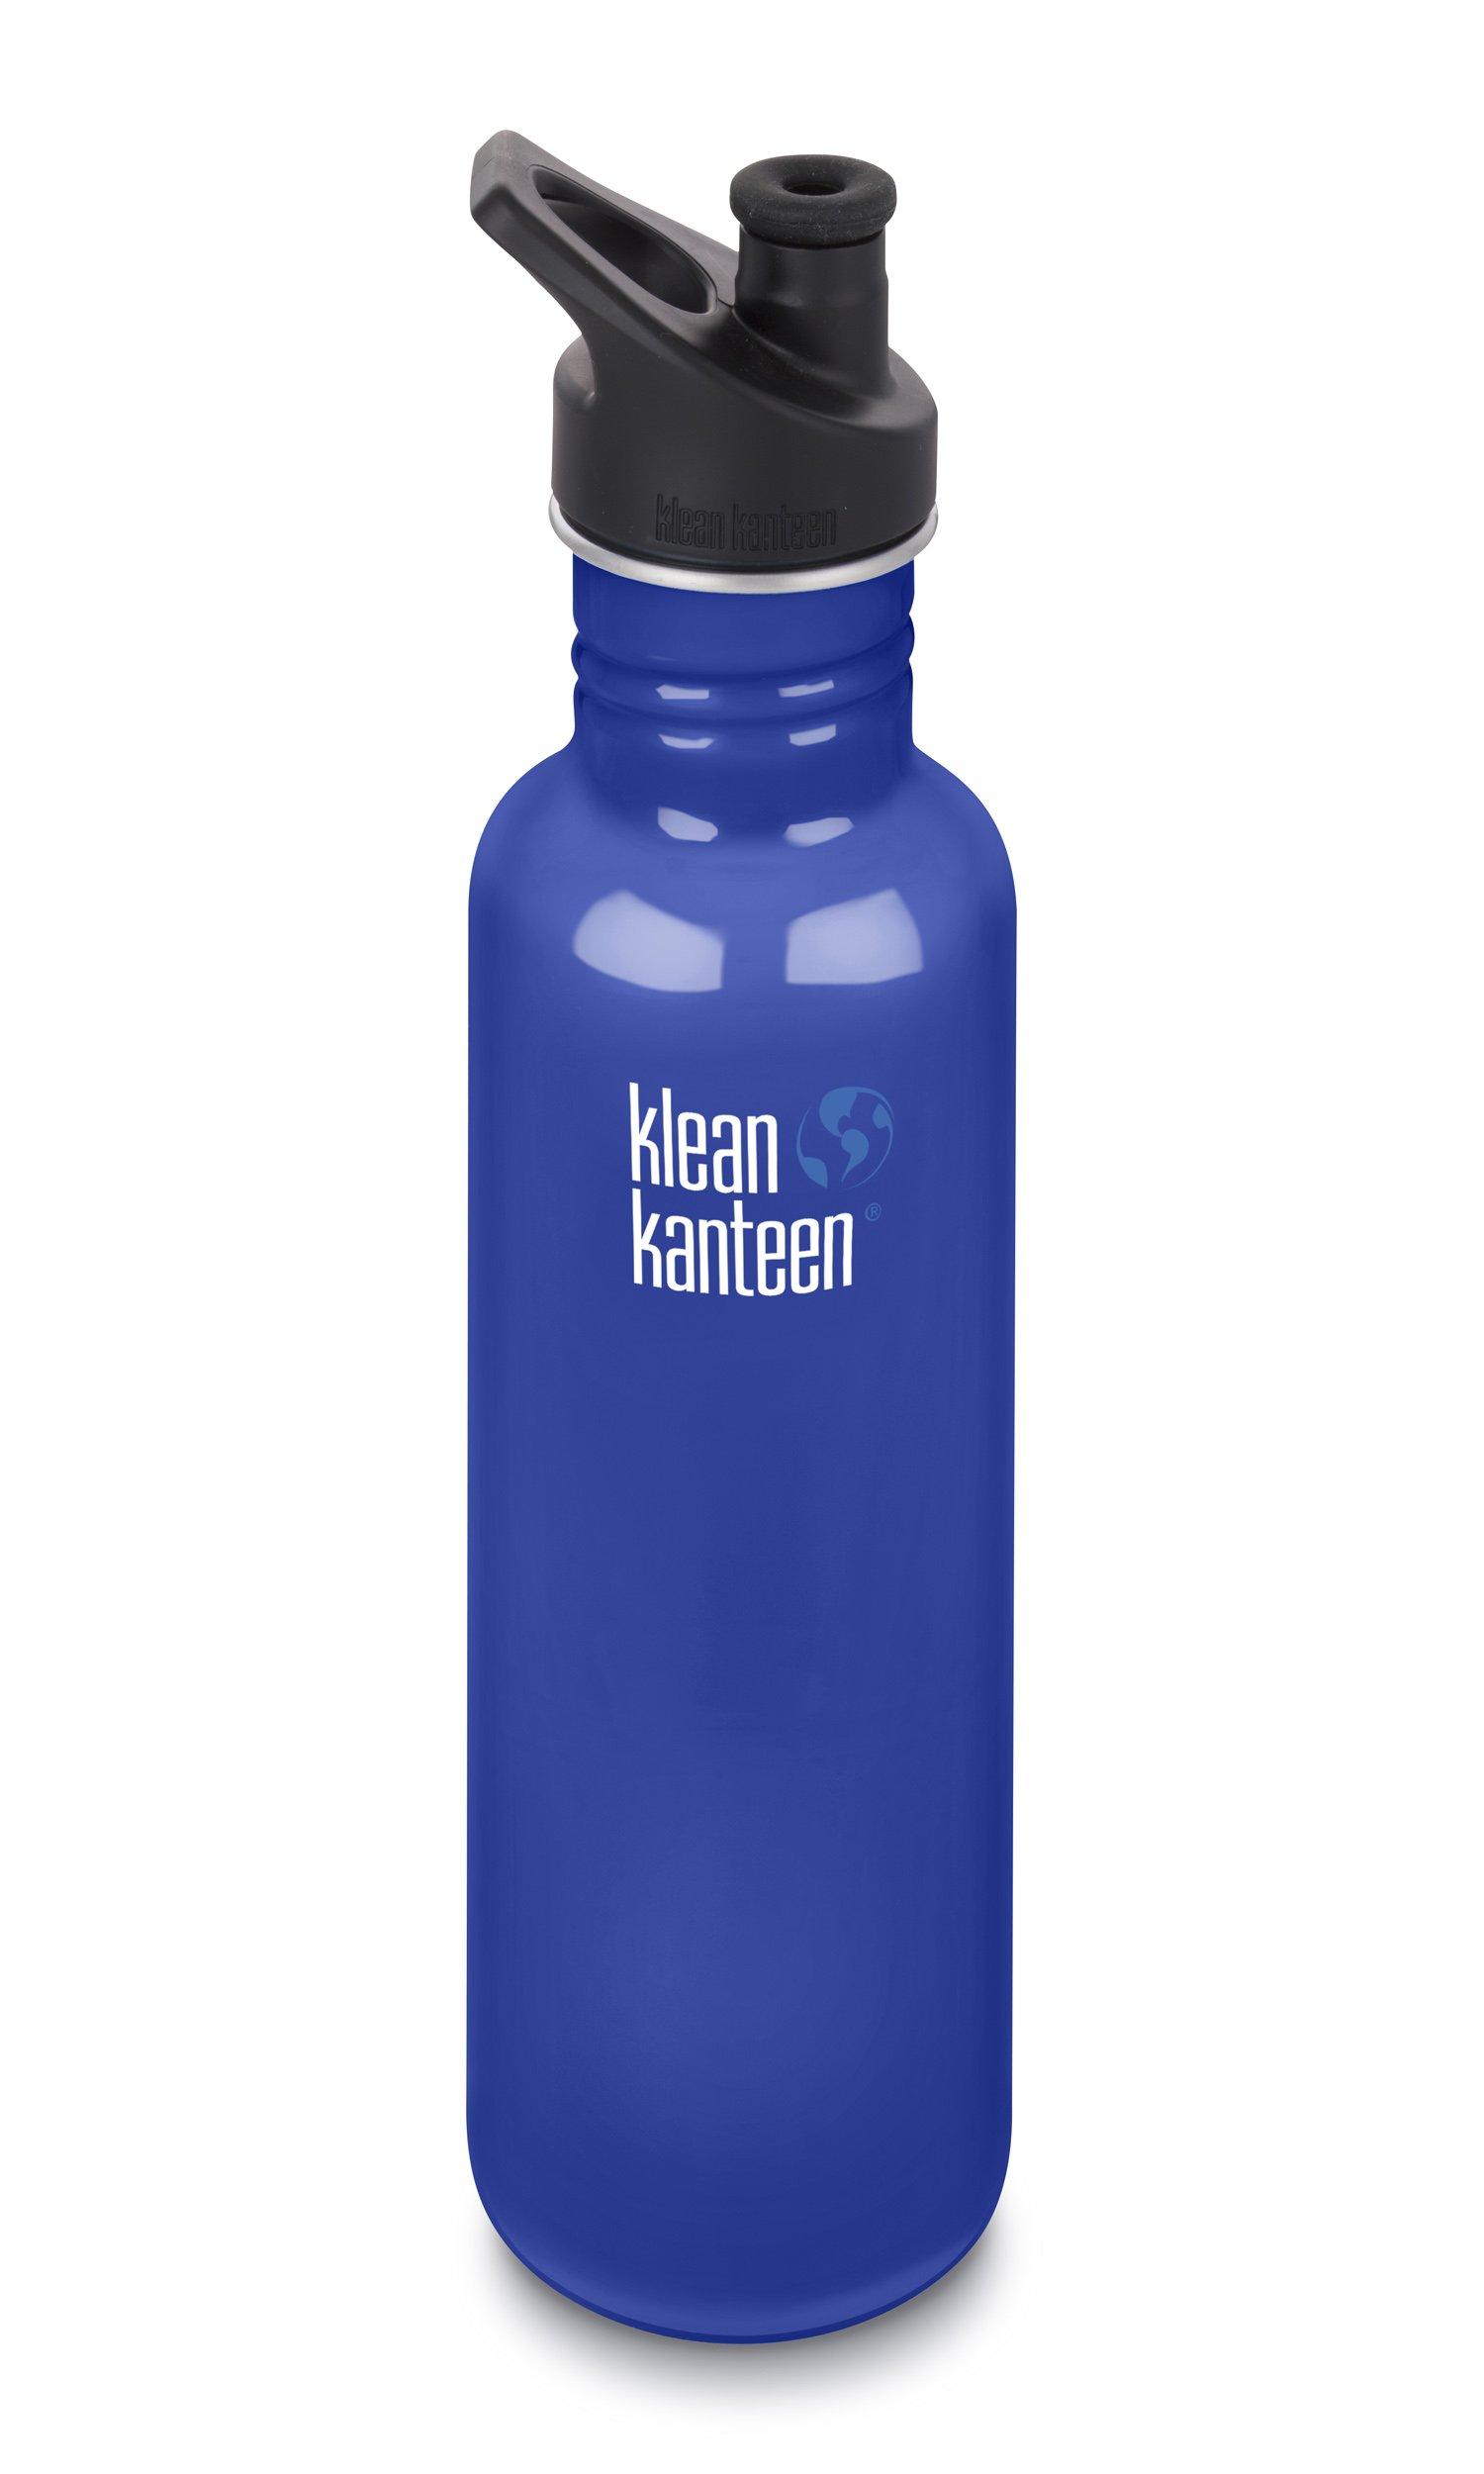 Klean Kanteen 27oz Classic Stainless Steel Water Bottle with Klean Coat, Single Wall and Leak Resistant Sport Cap 3.0 - Coastal Waters